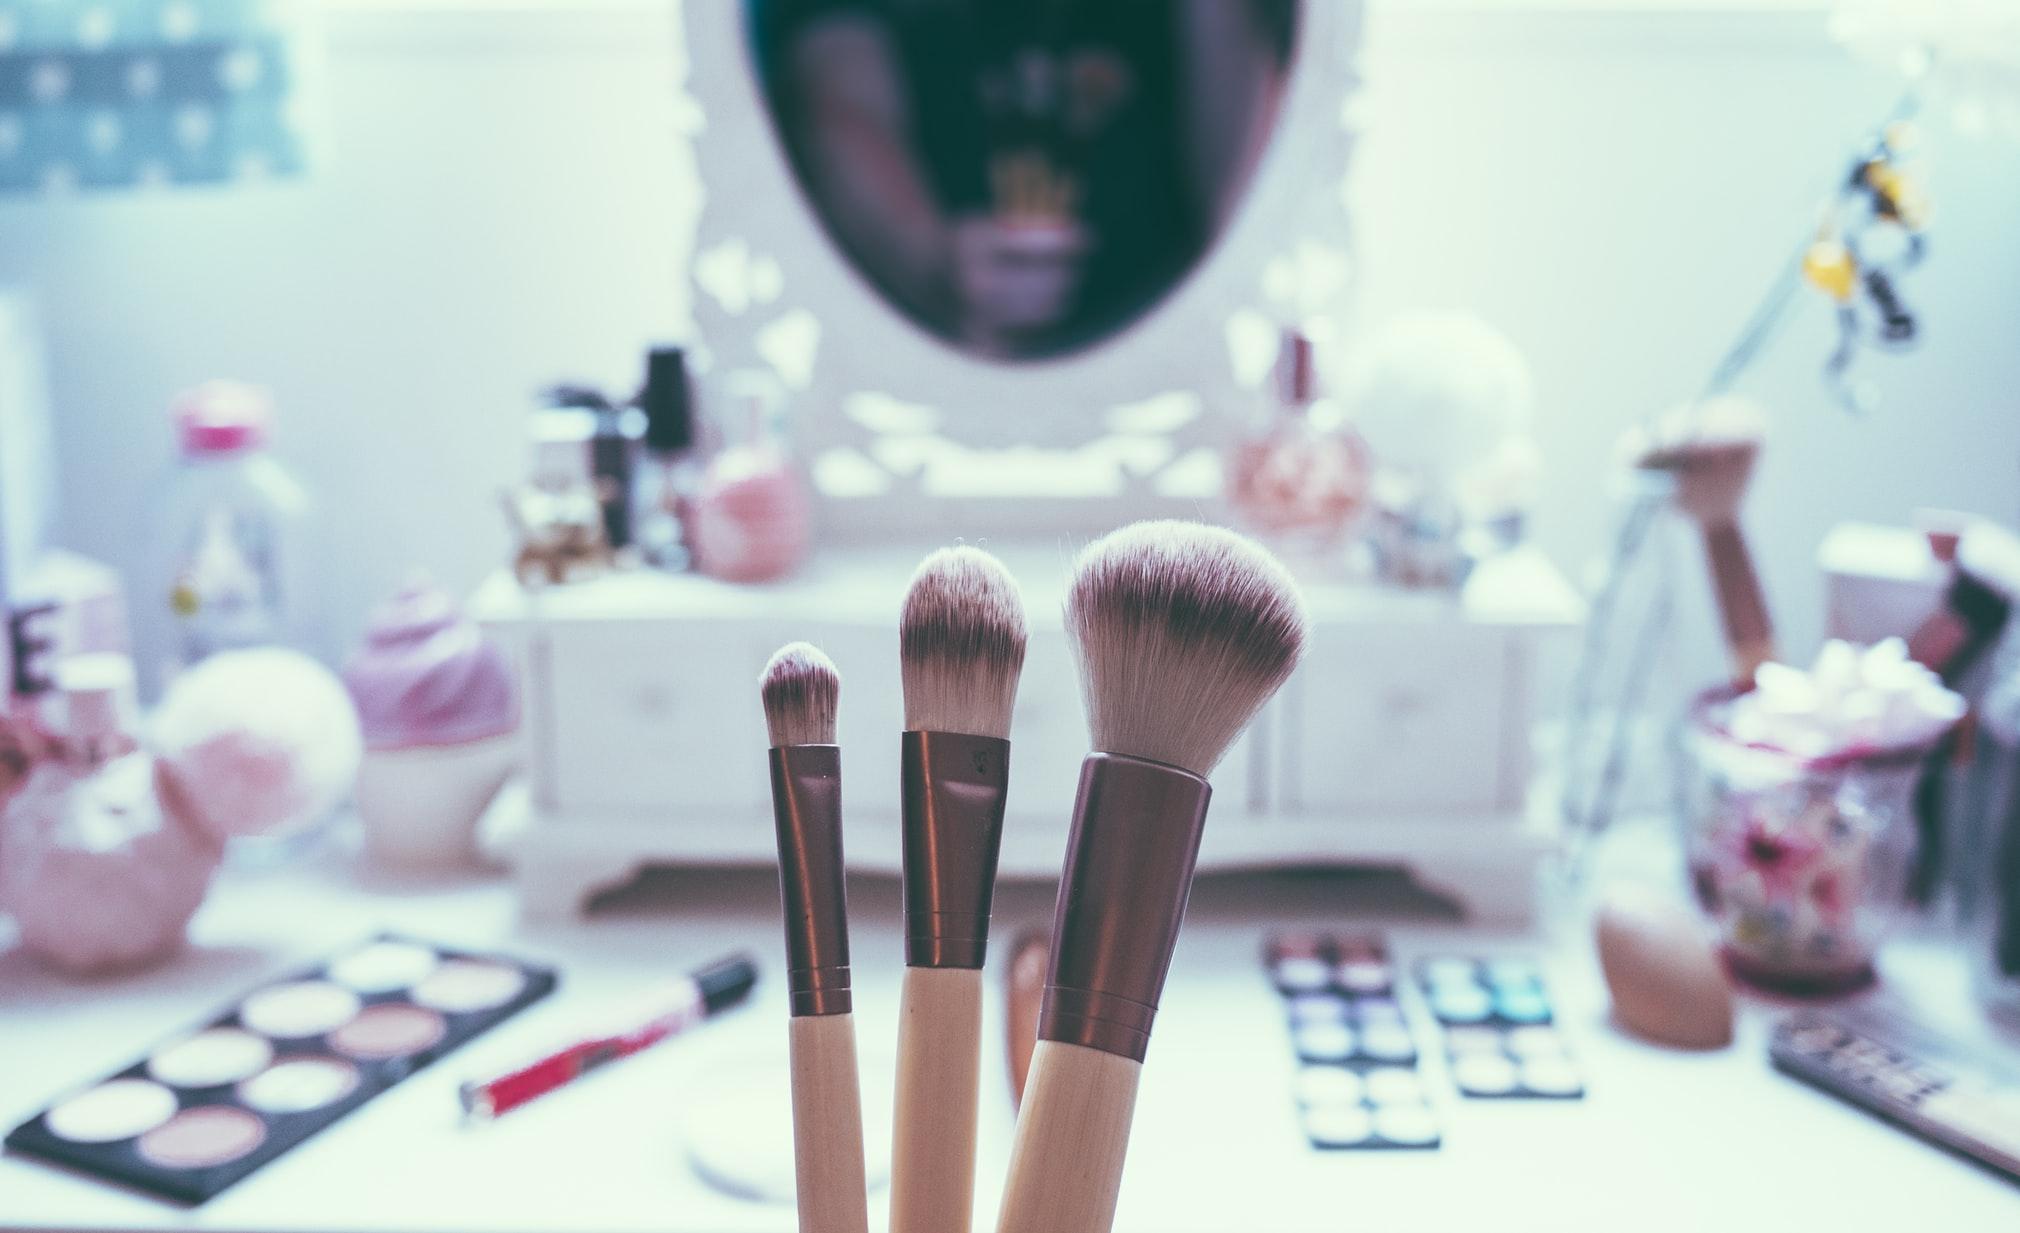 Kosmetikstudio Zubehör